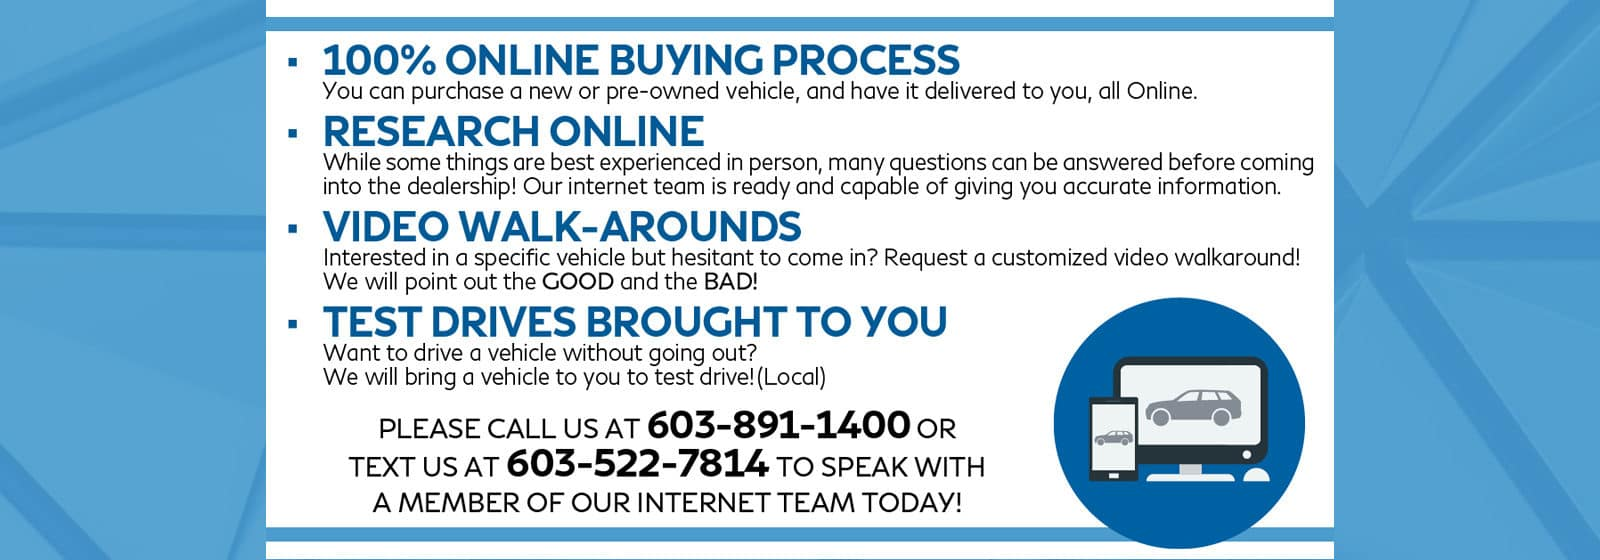 Slide explaining the online buying process. Call dealer at 603-891-1400 for more details.